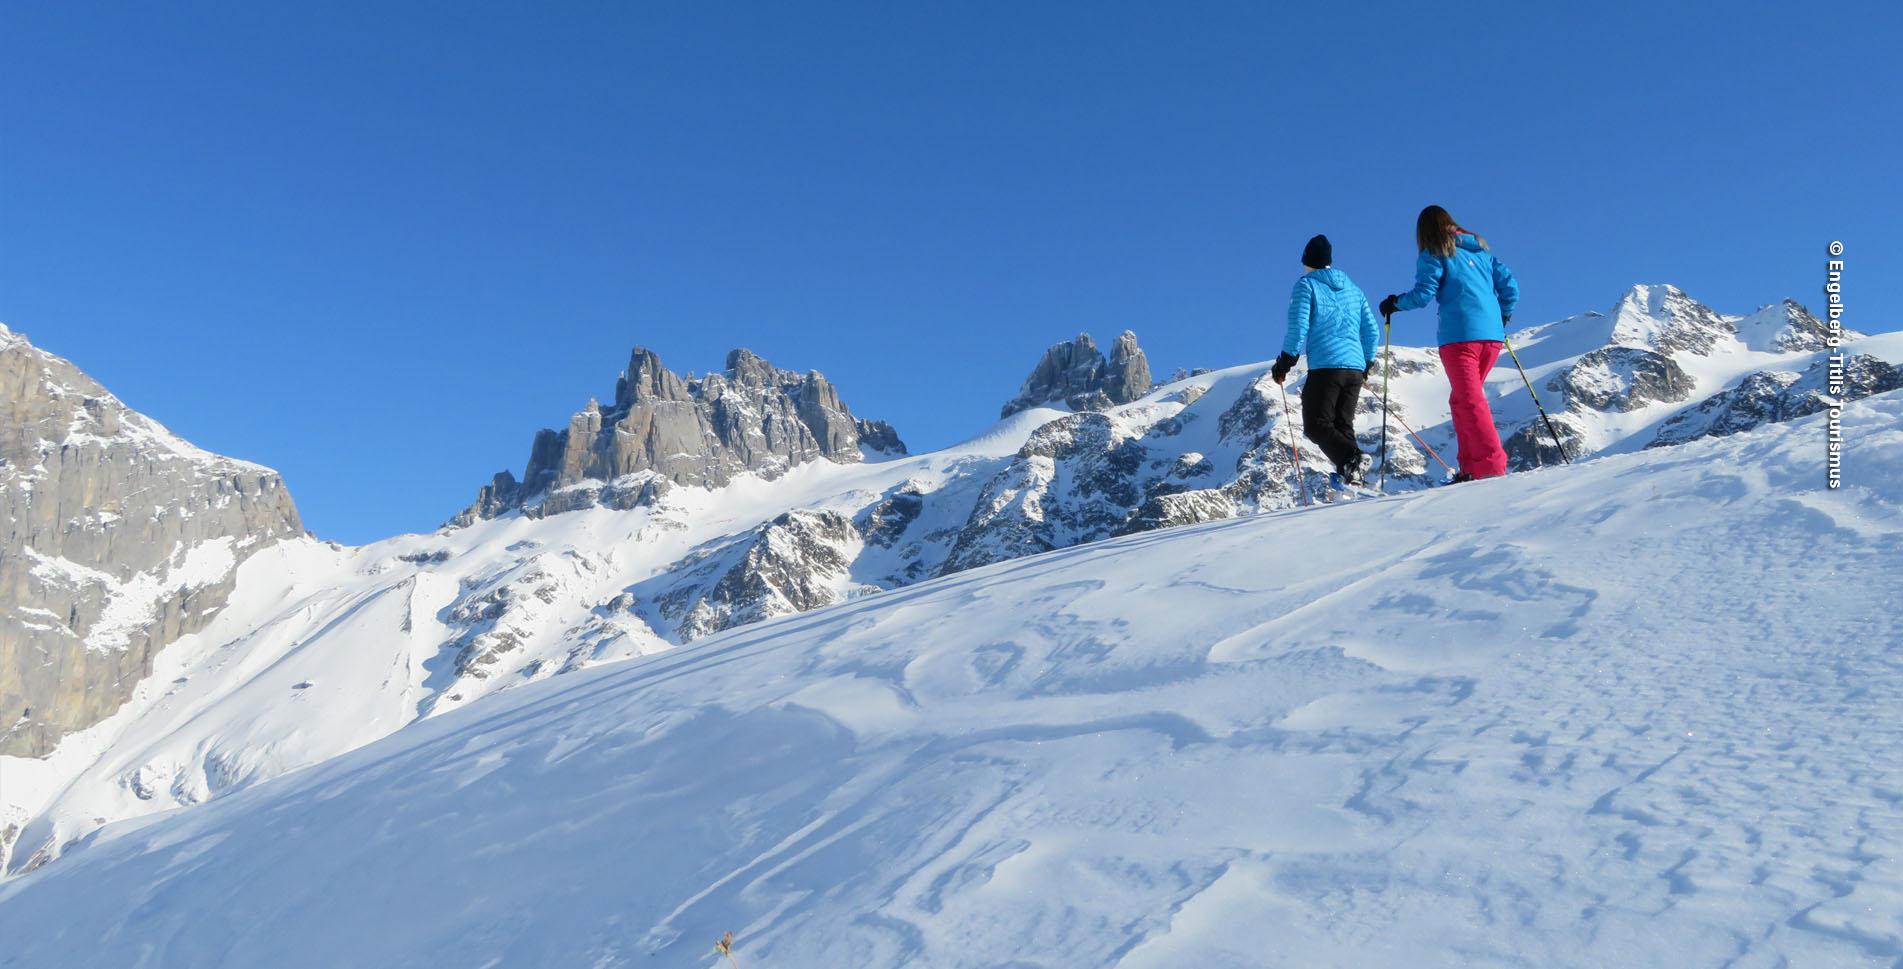 Klettersteig Fürenalp : Schneeschuhtour engelberg fürenalp grotzli trail wegwandern.ch